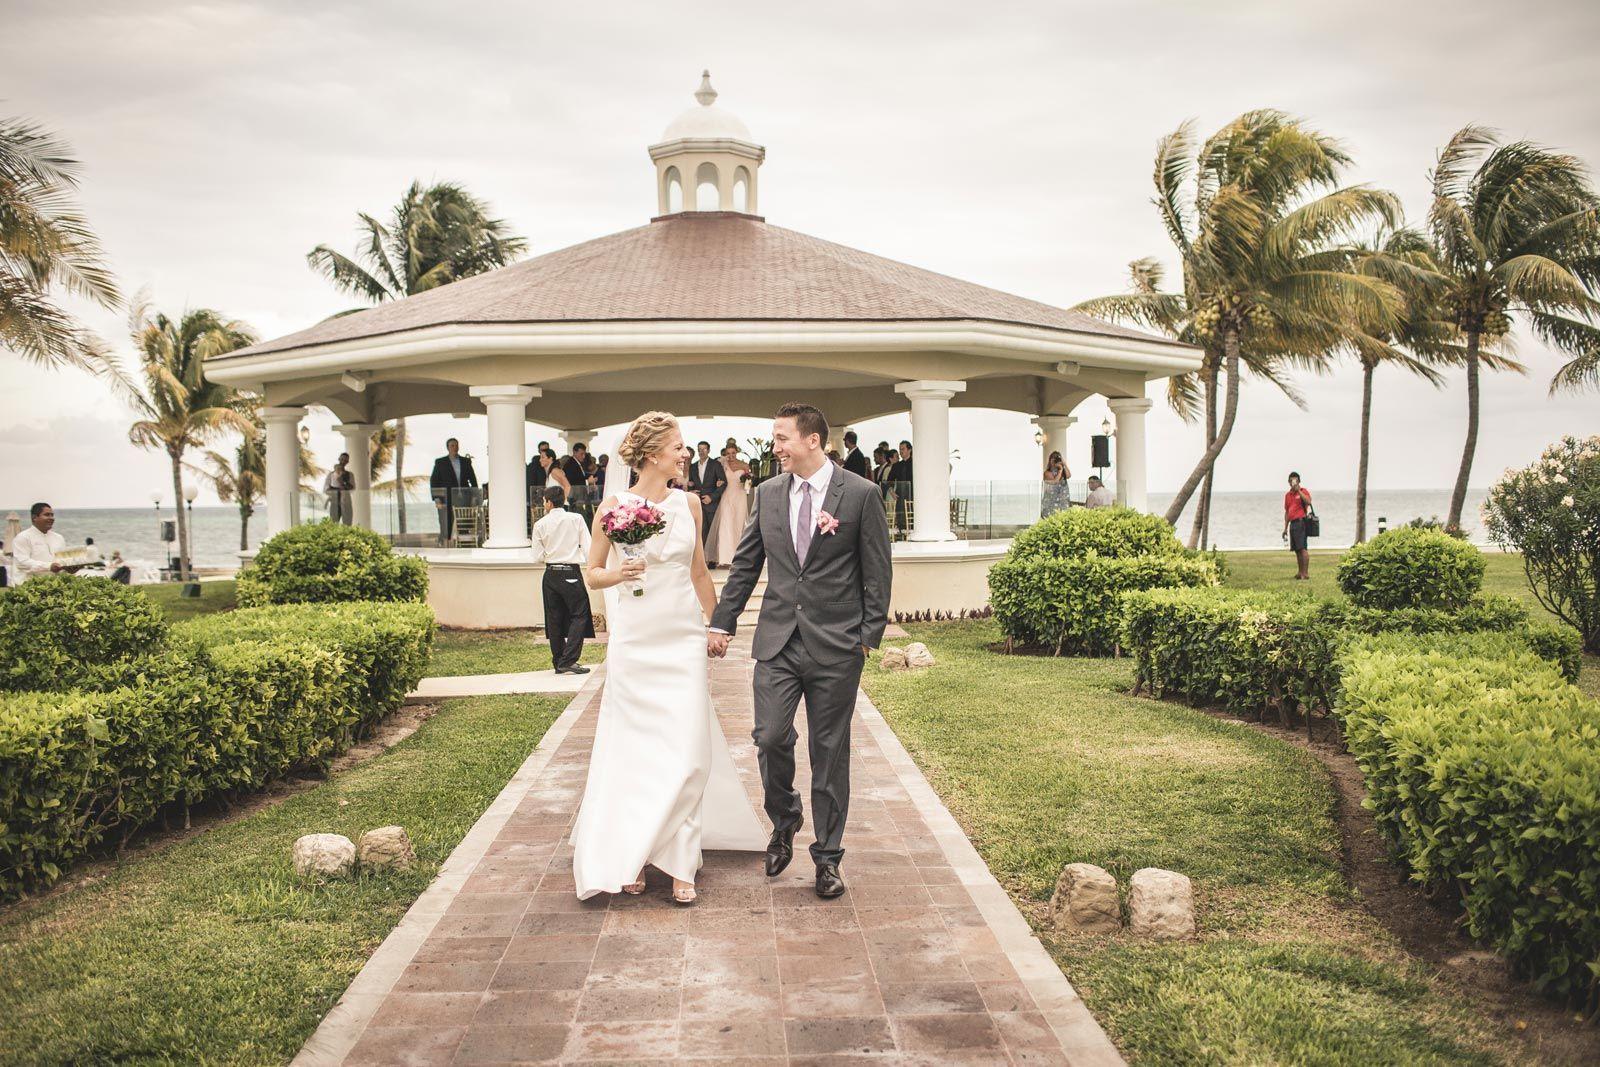 Cancun Wedding At Moon Palace Resort Adrian Bonet Moon Palace Dream Beach Wedding Beach Photos